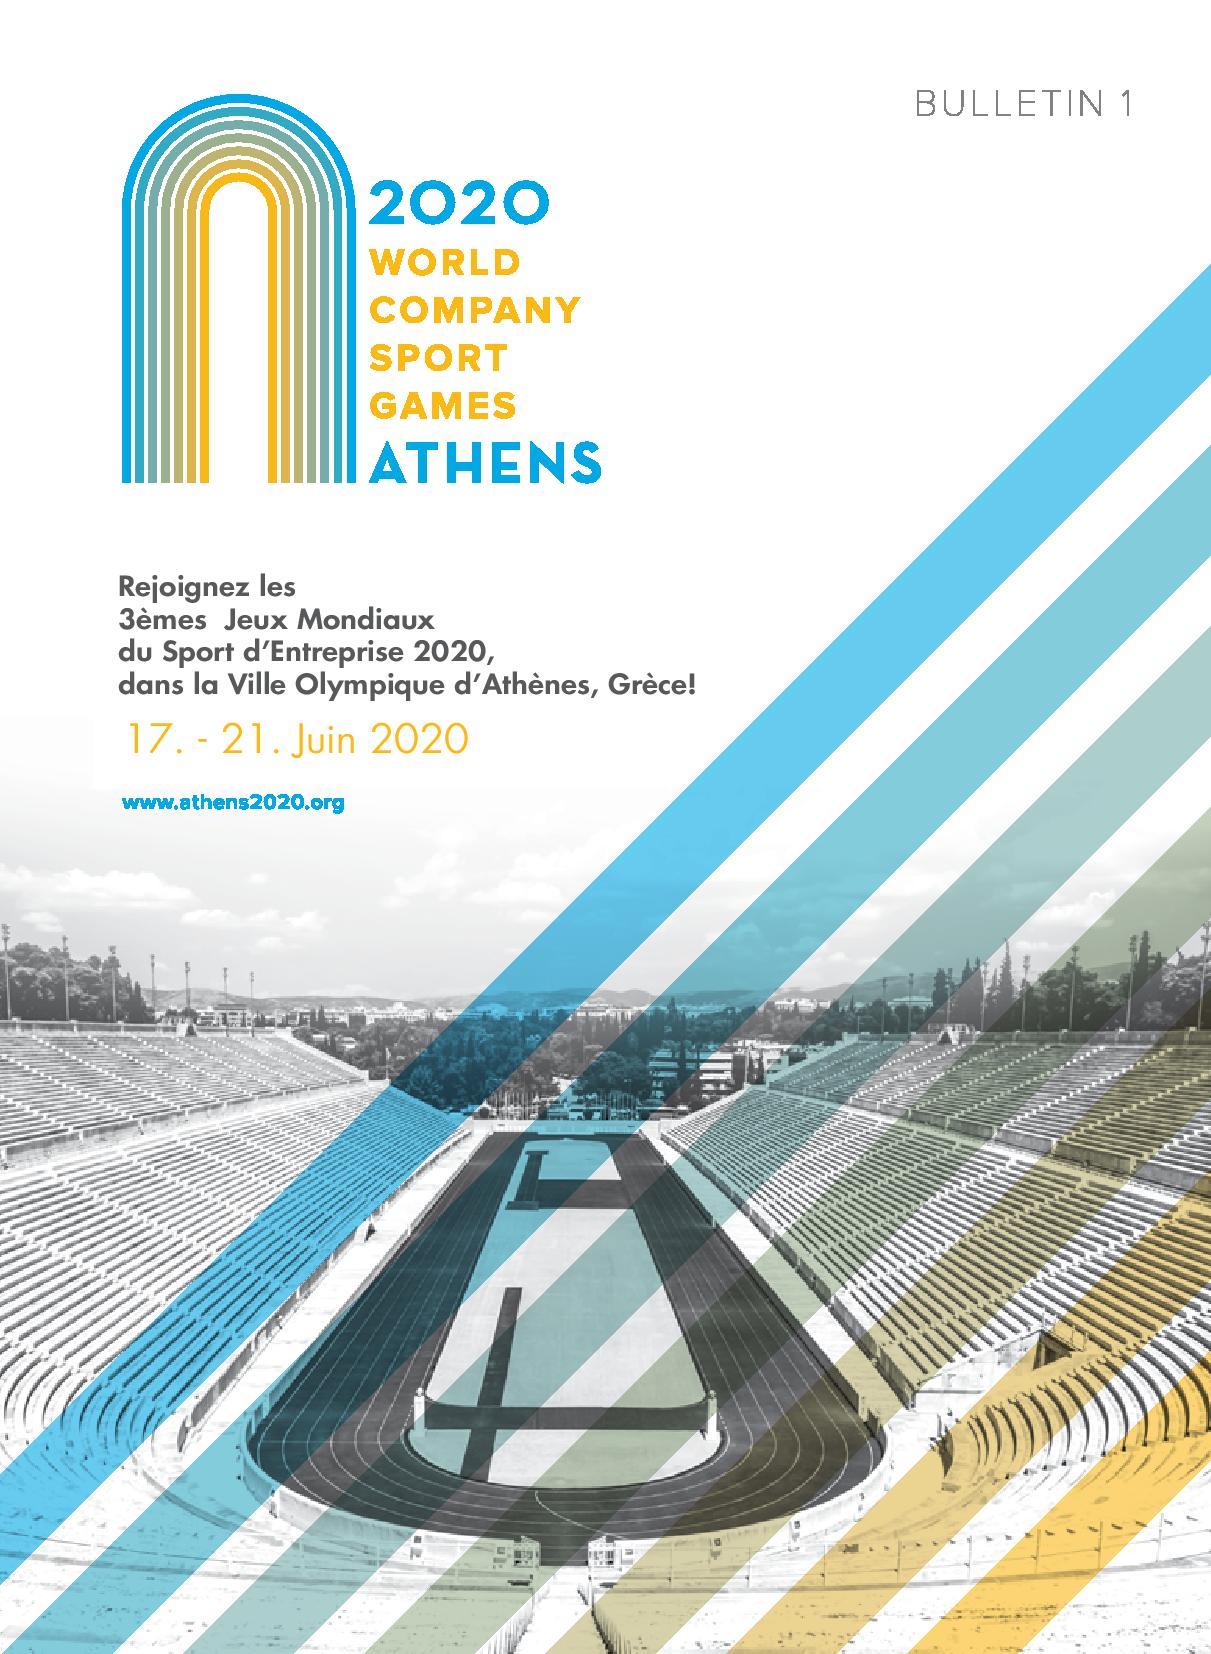 Jeux Mondiaux 2020 Athenes